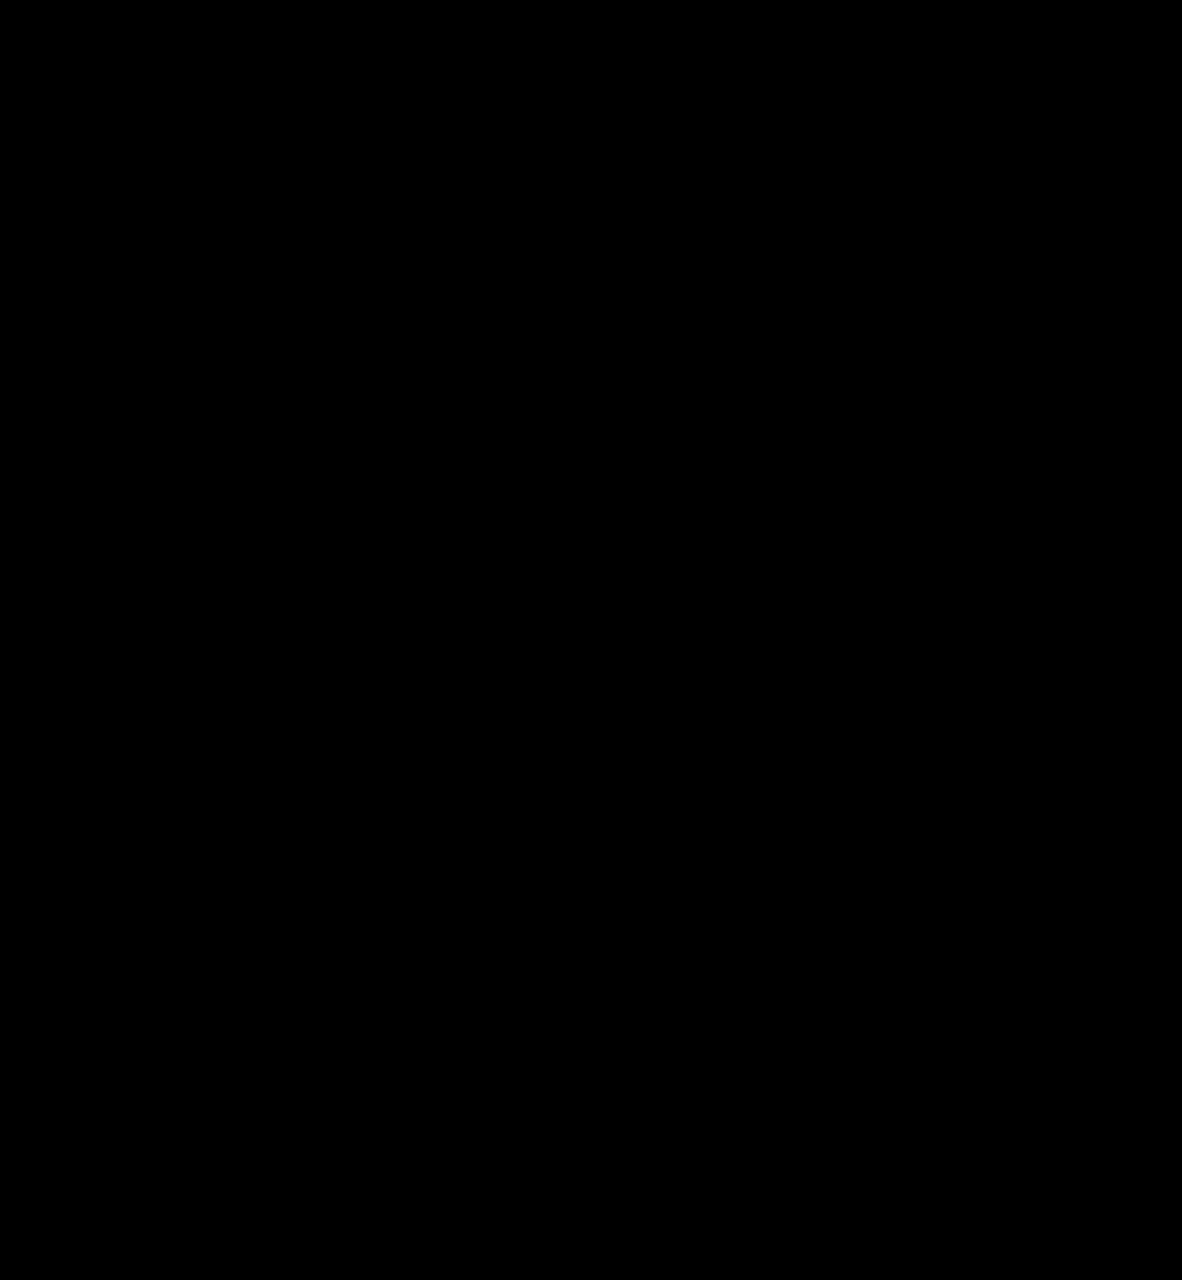 Satwa Semut Serangga Huruf   Gambar vektor gratis di Pixabay